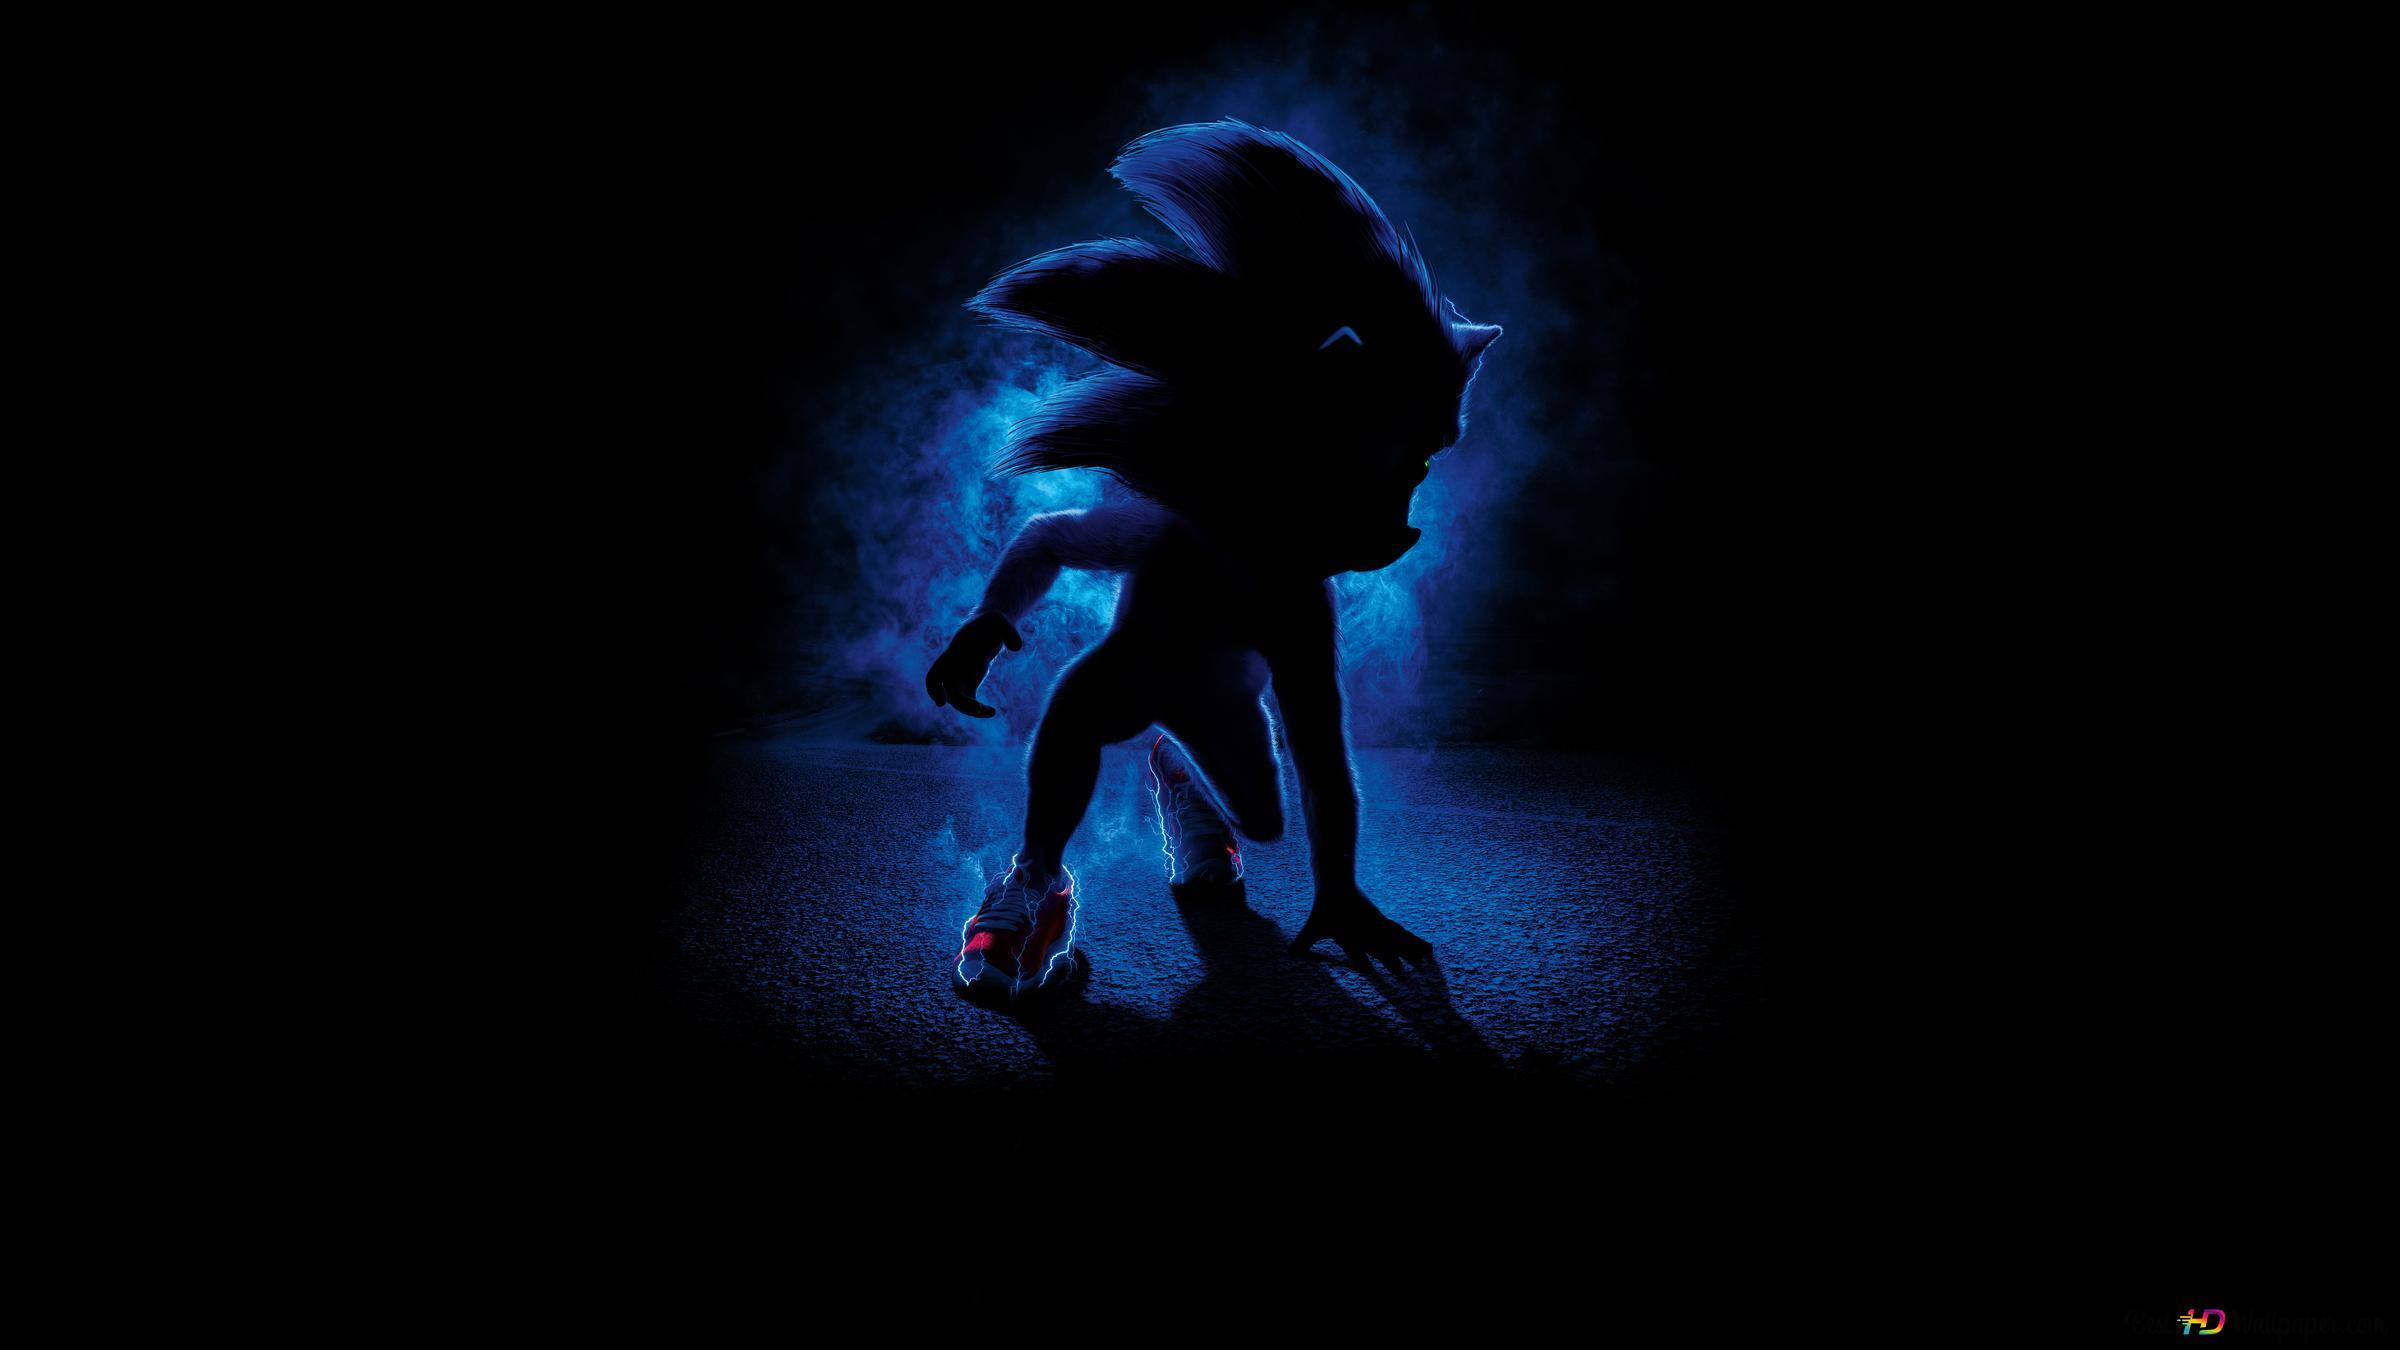 Sonic The Hedgehog 2020 Unduhan Wallpaper Hd